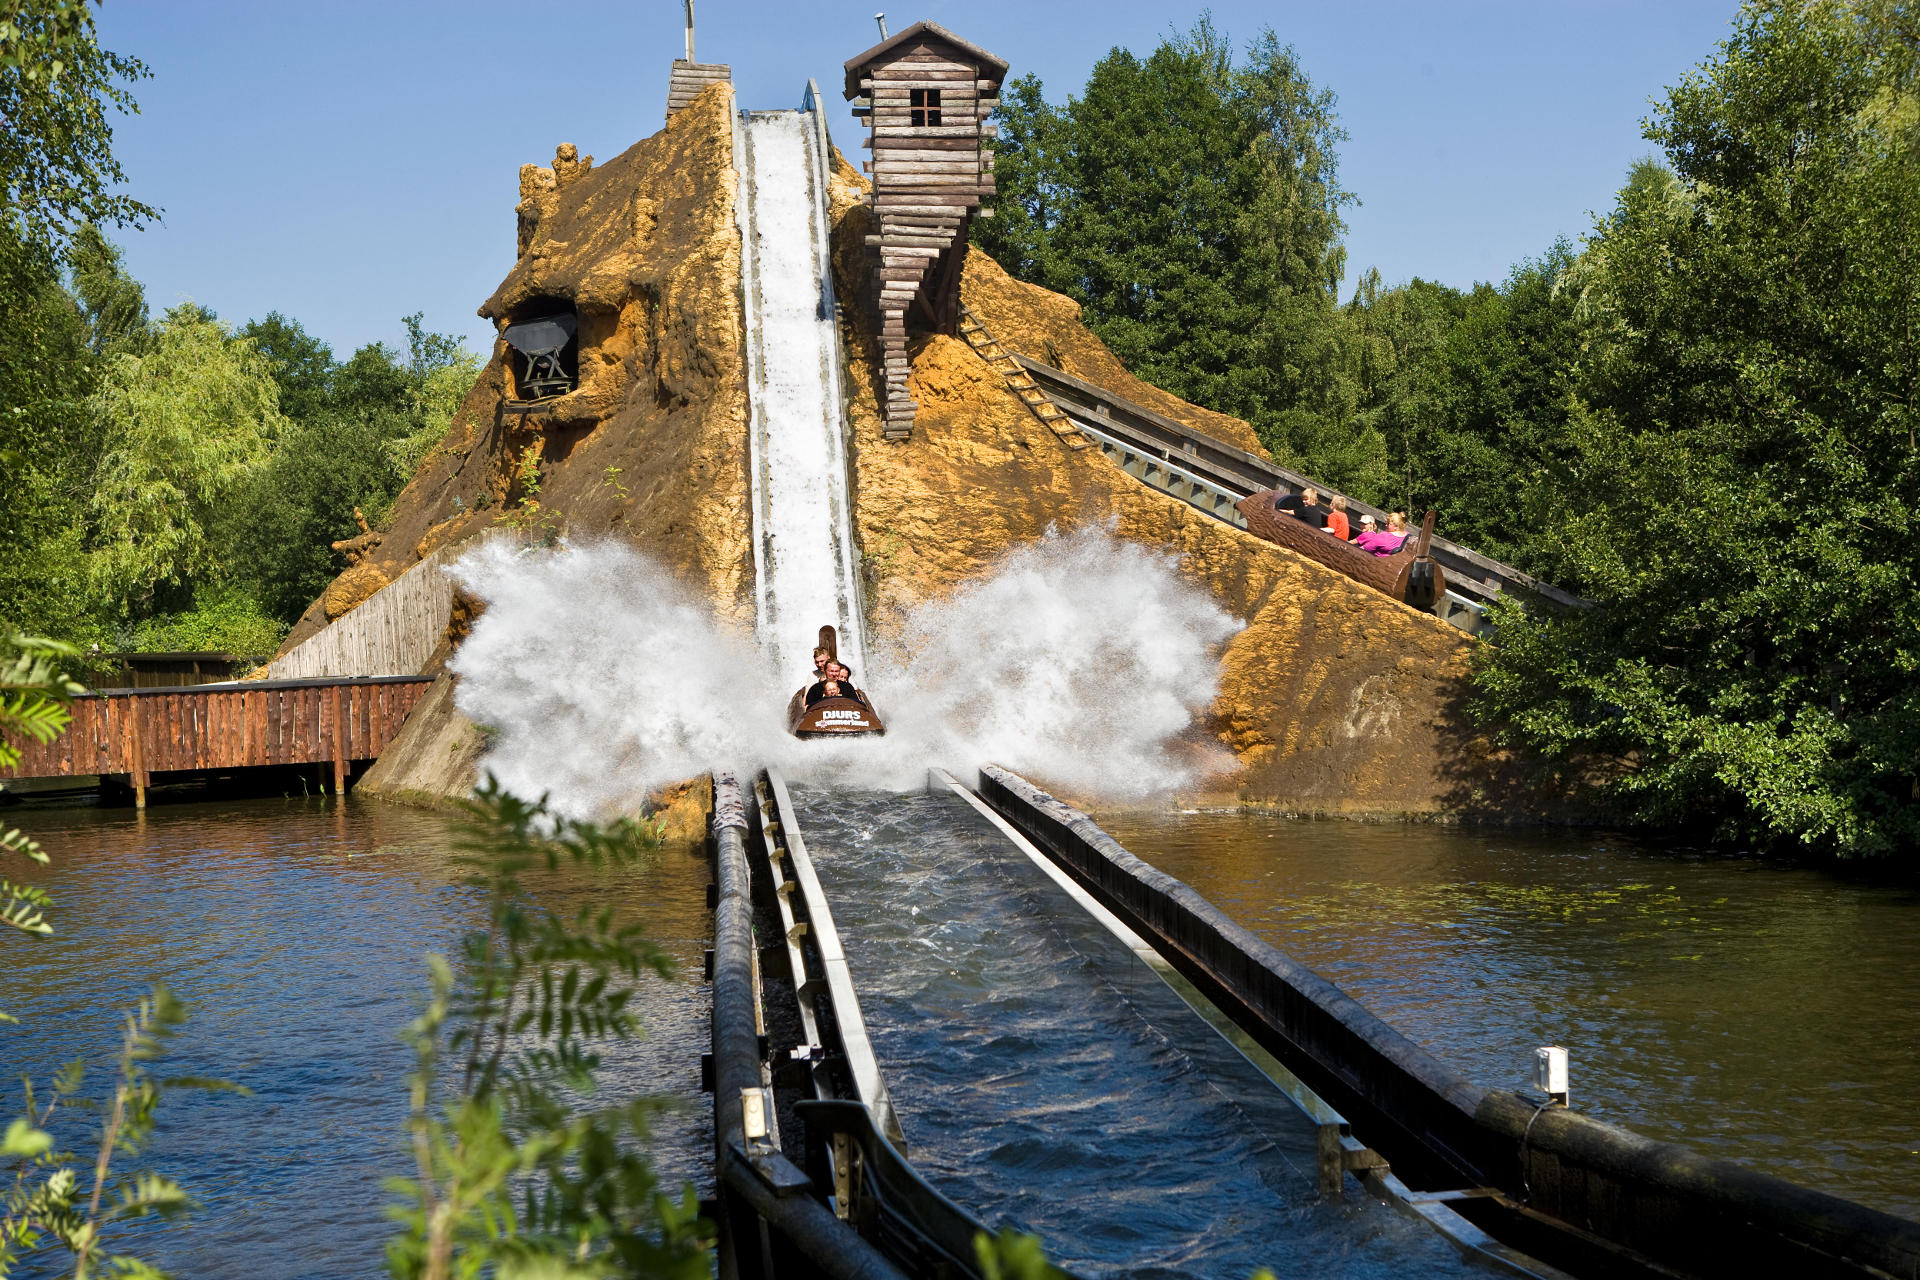 interlink log superflume water ride denmark